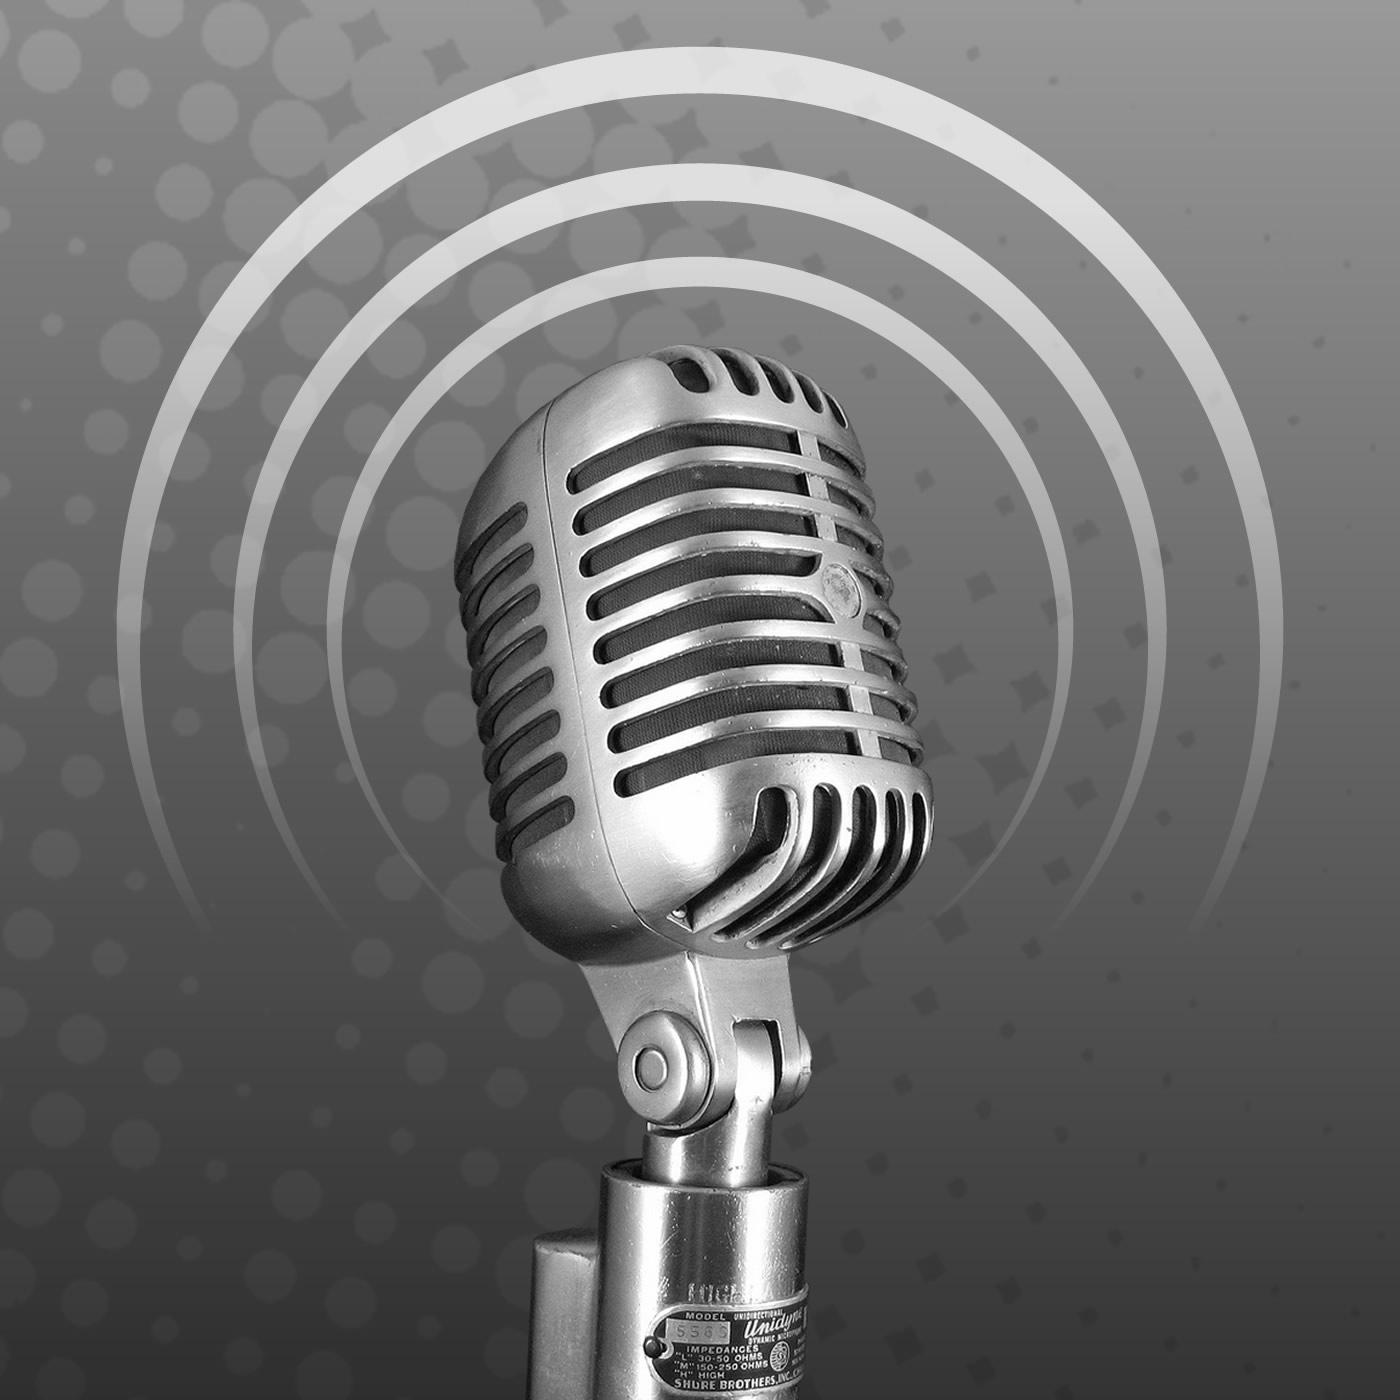 Call Mcr's Podcast